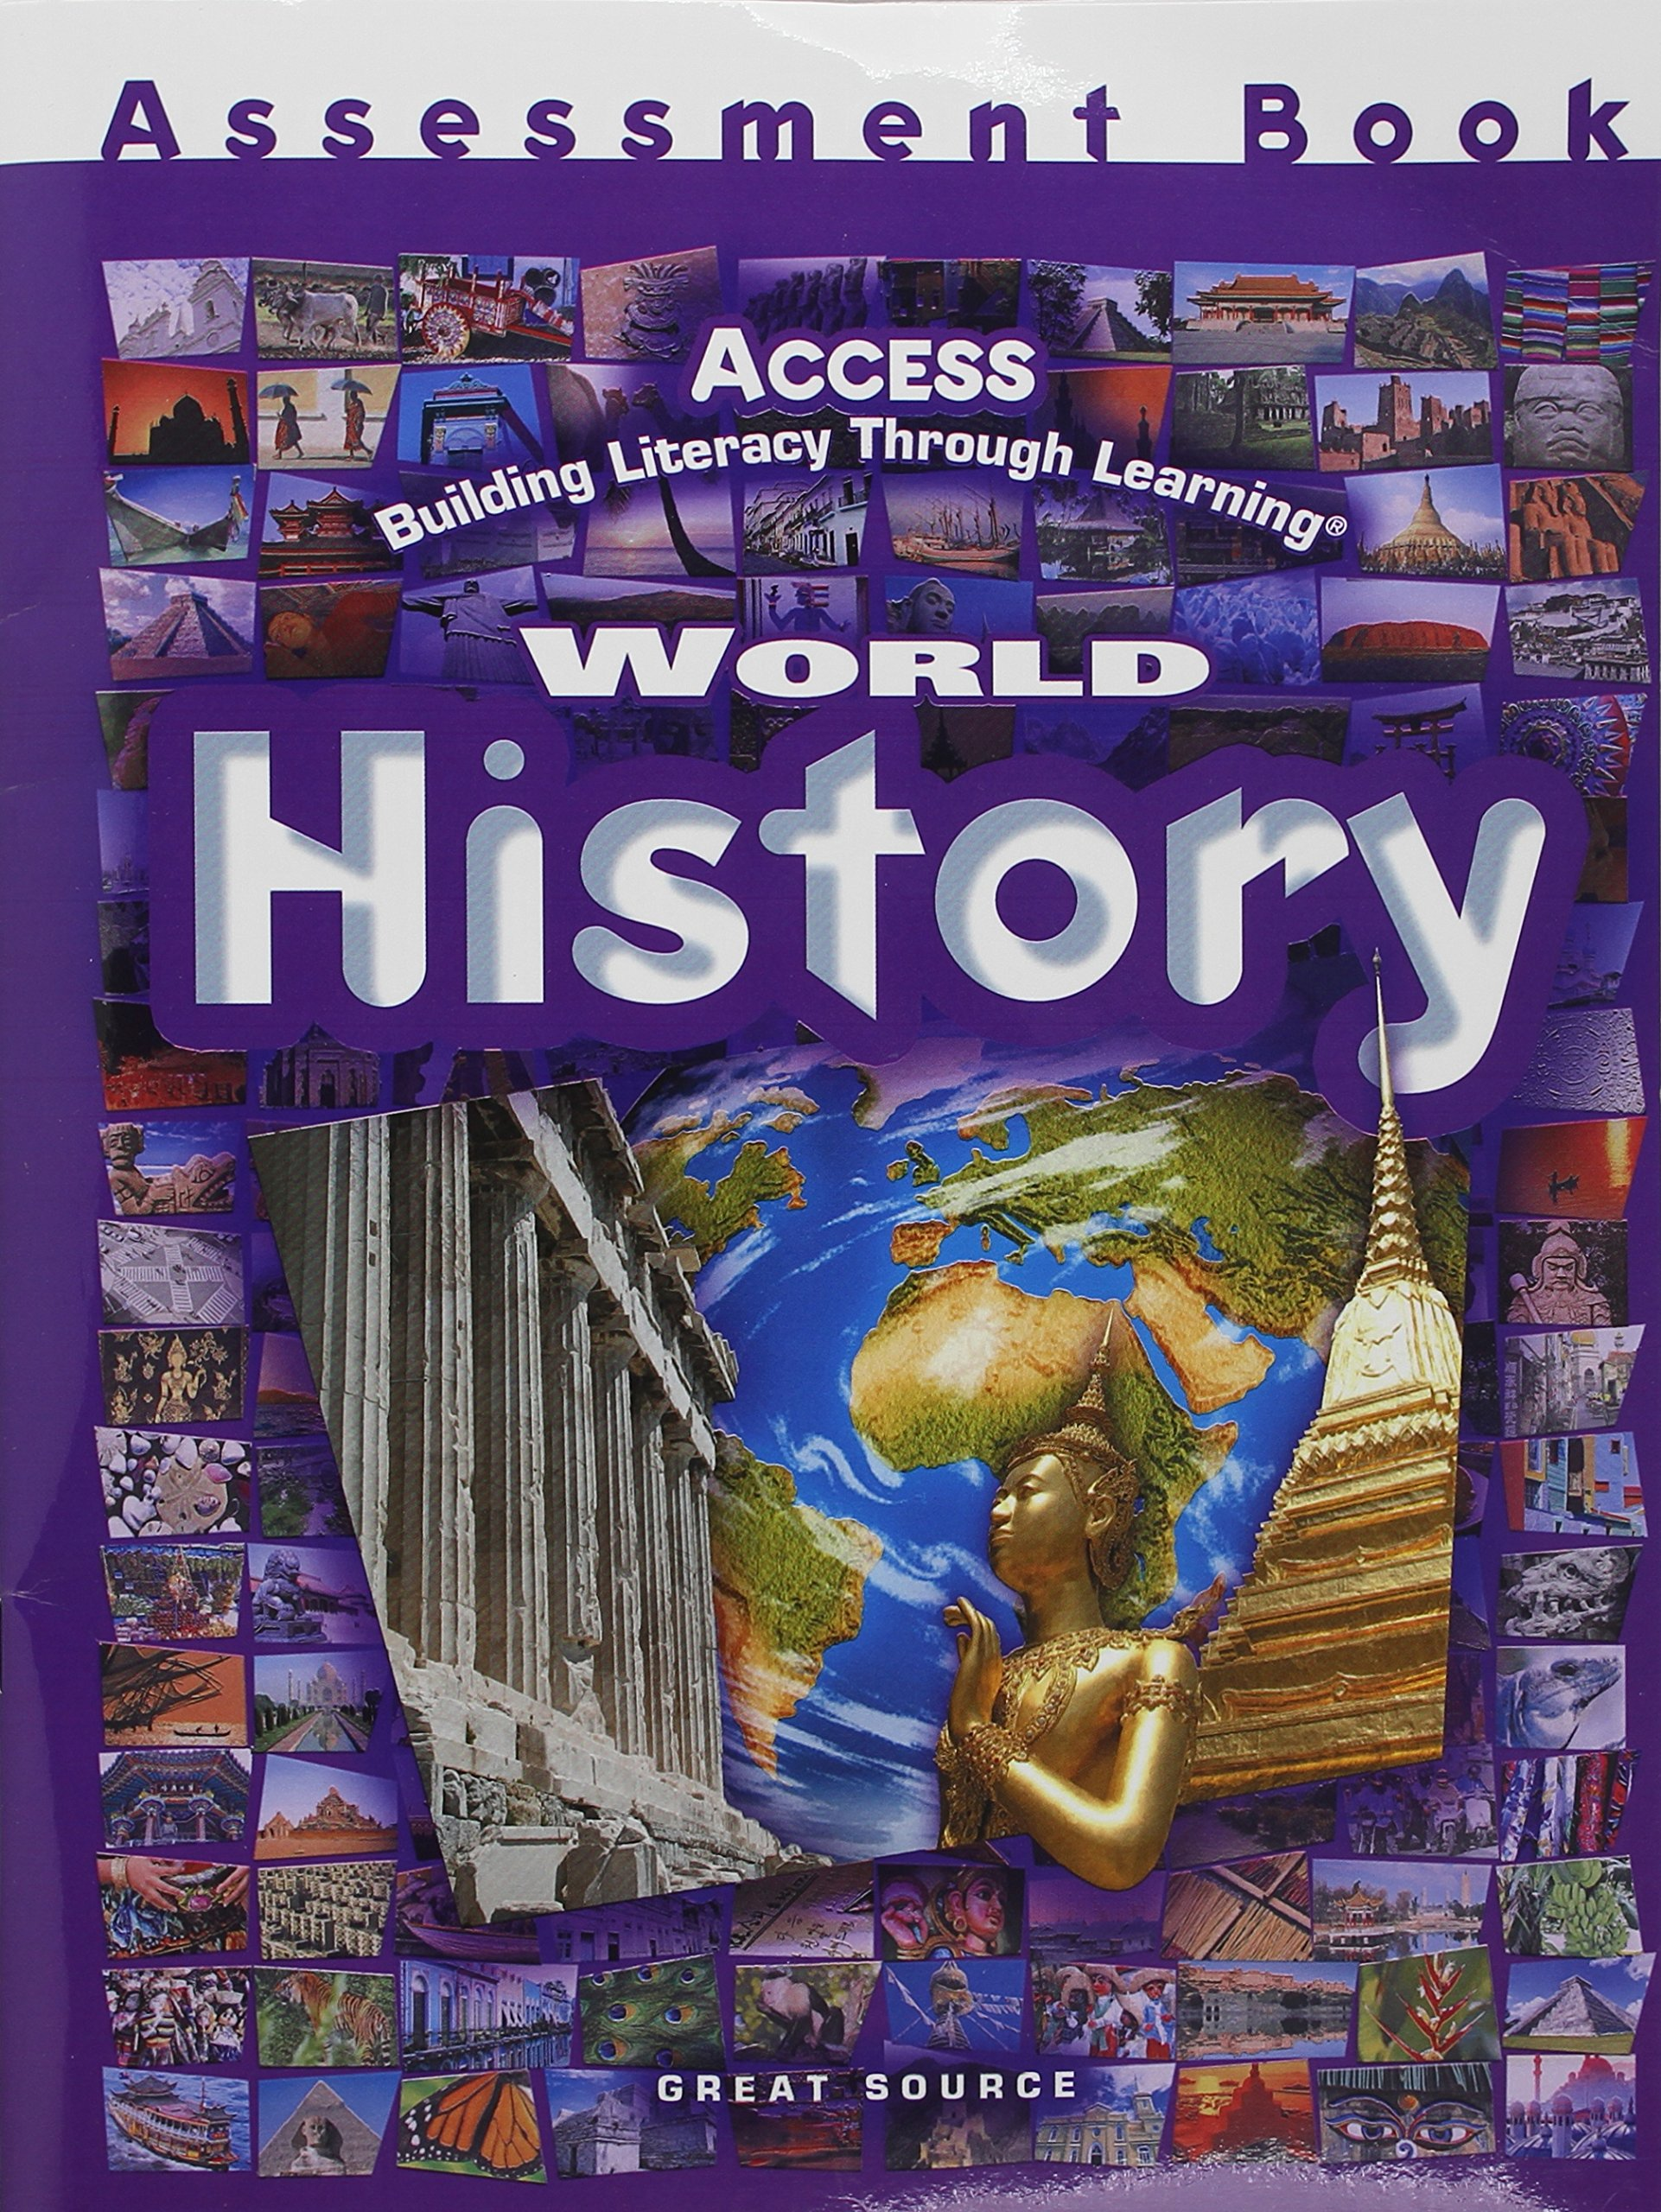 ACCESS World History: Assessment Book Grades 5-12